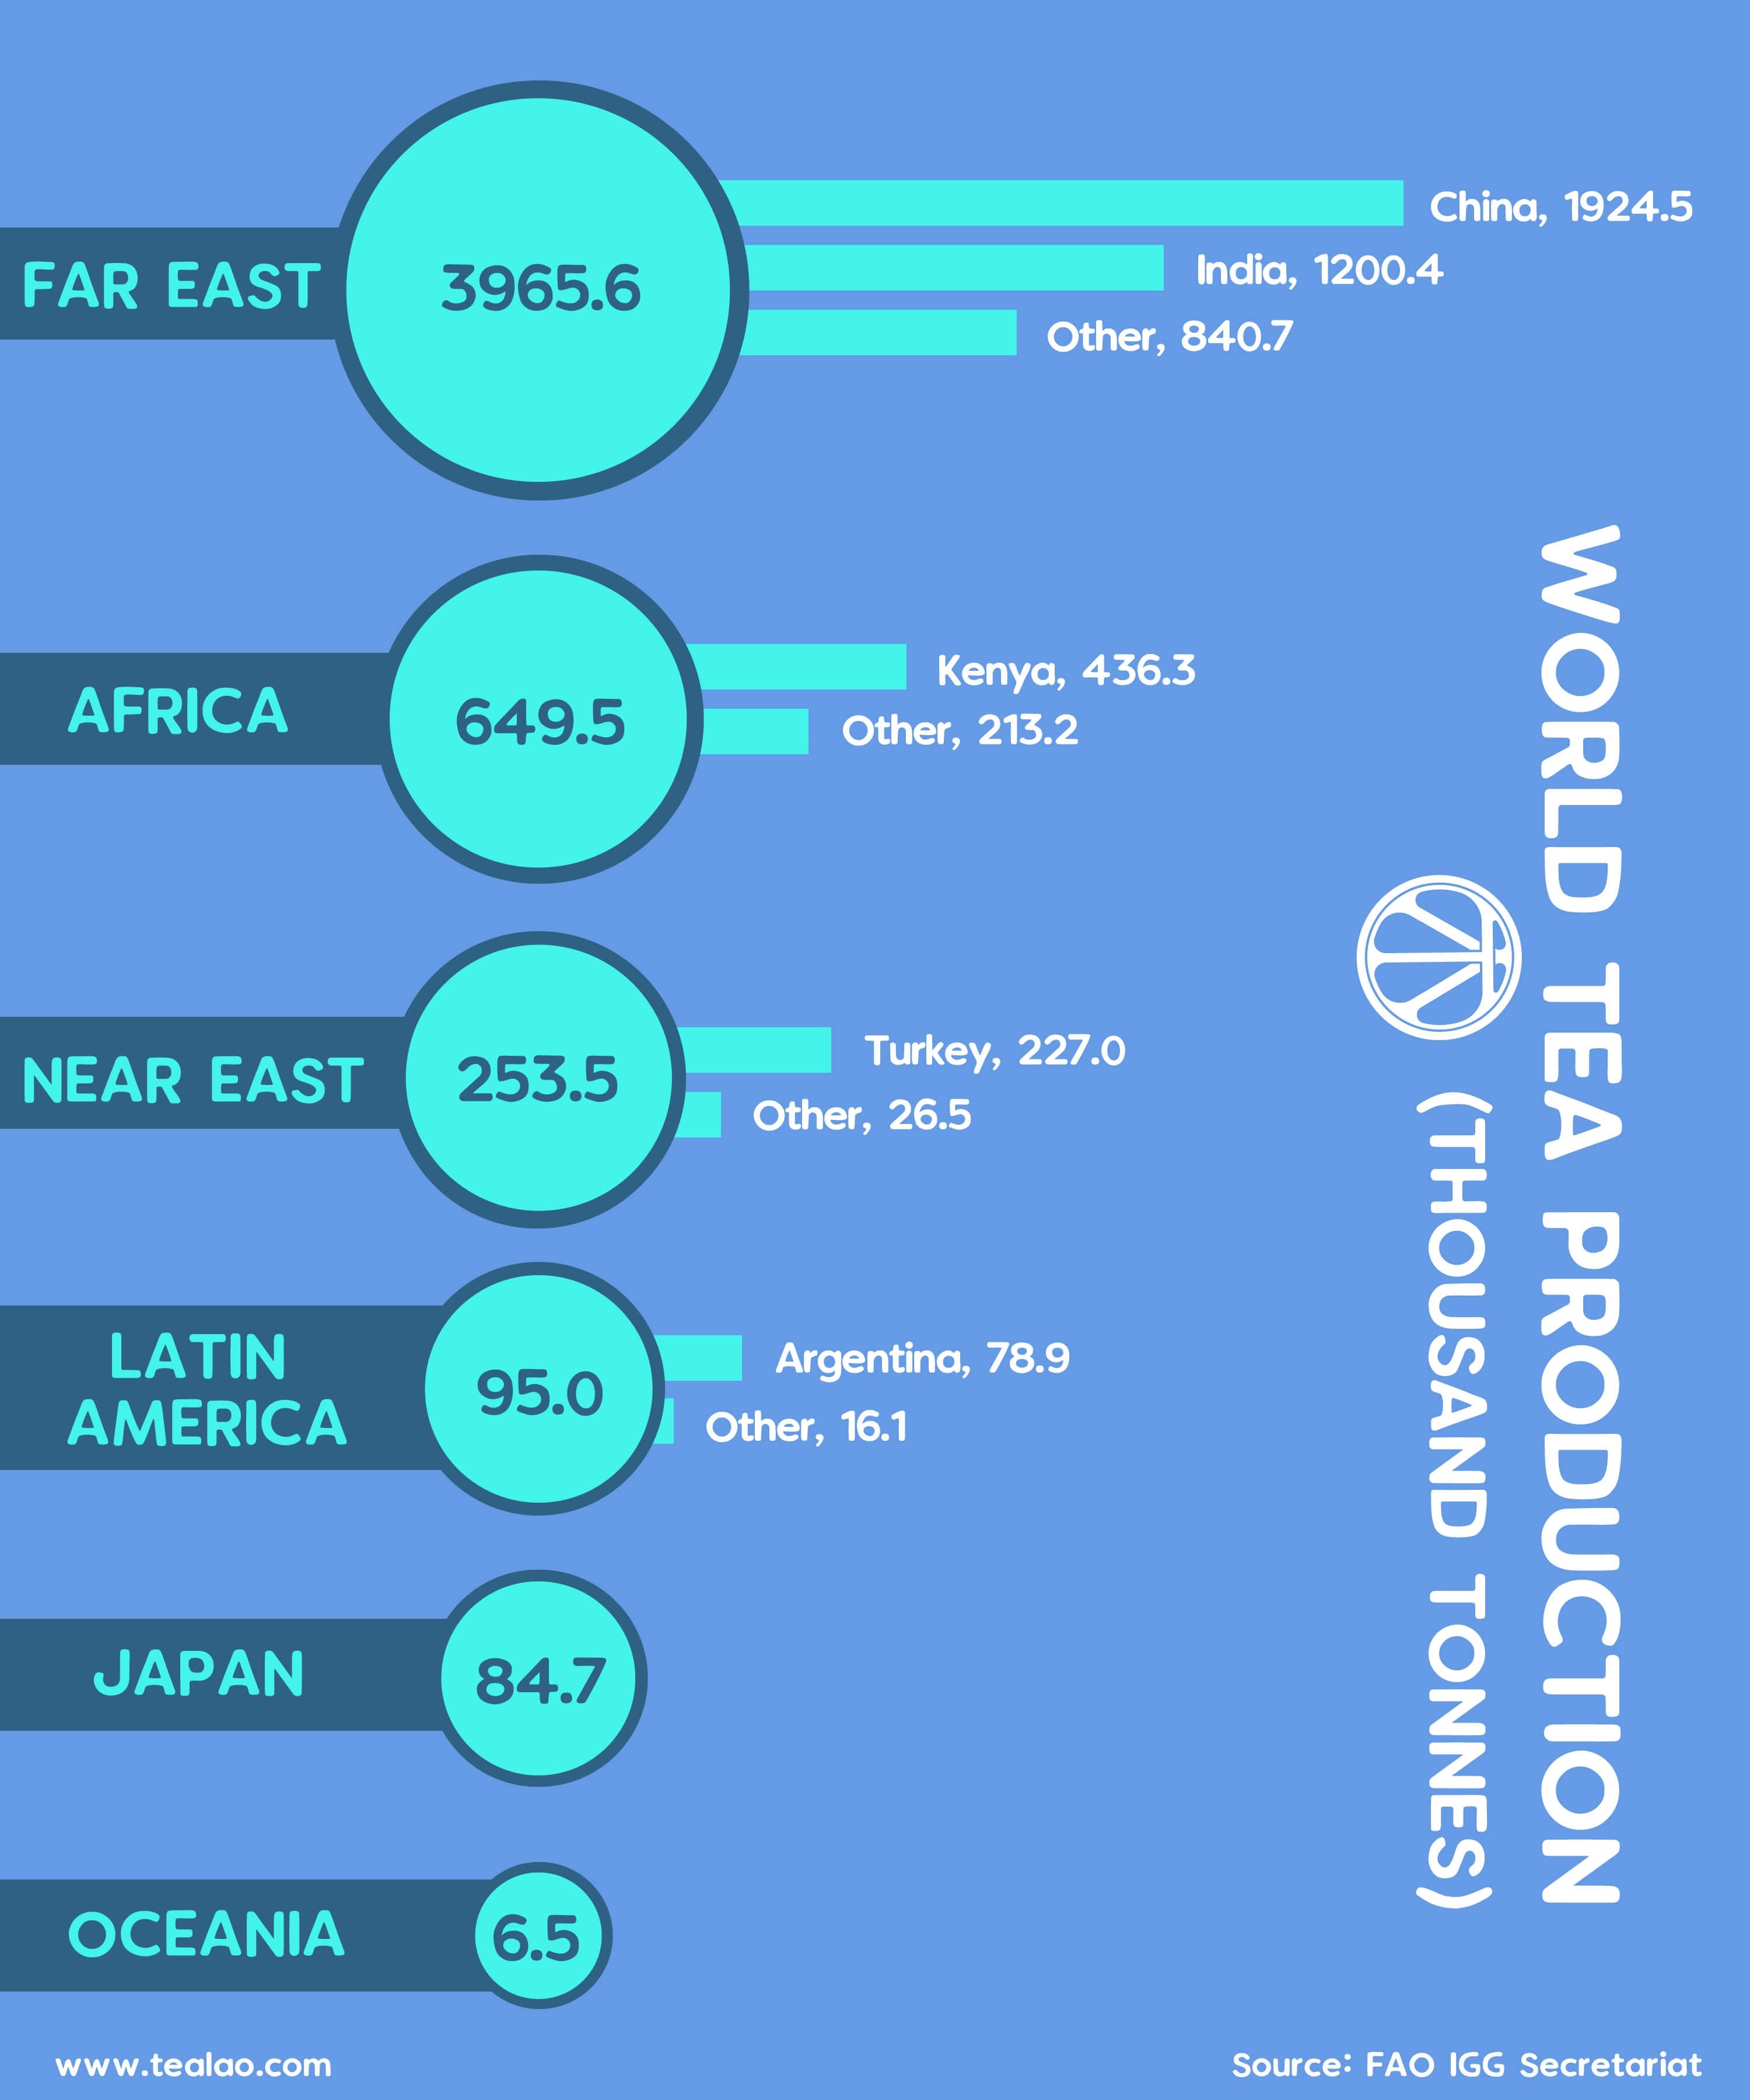 World Tea Production #infographic